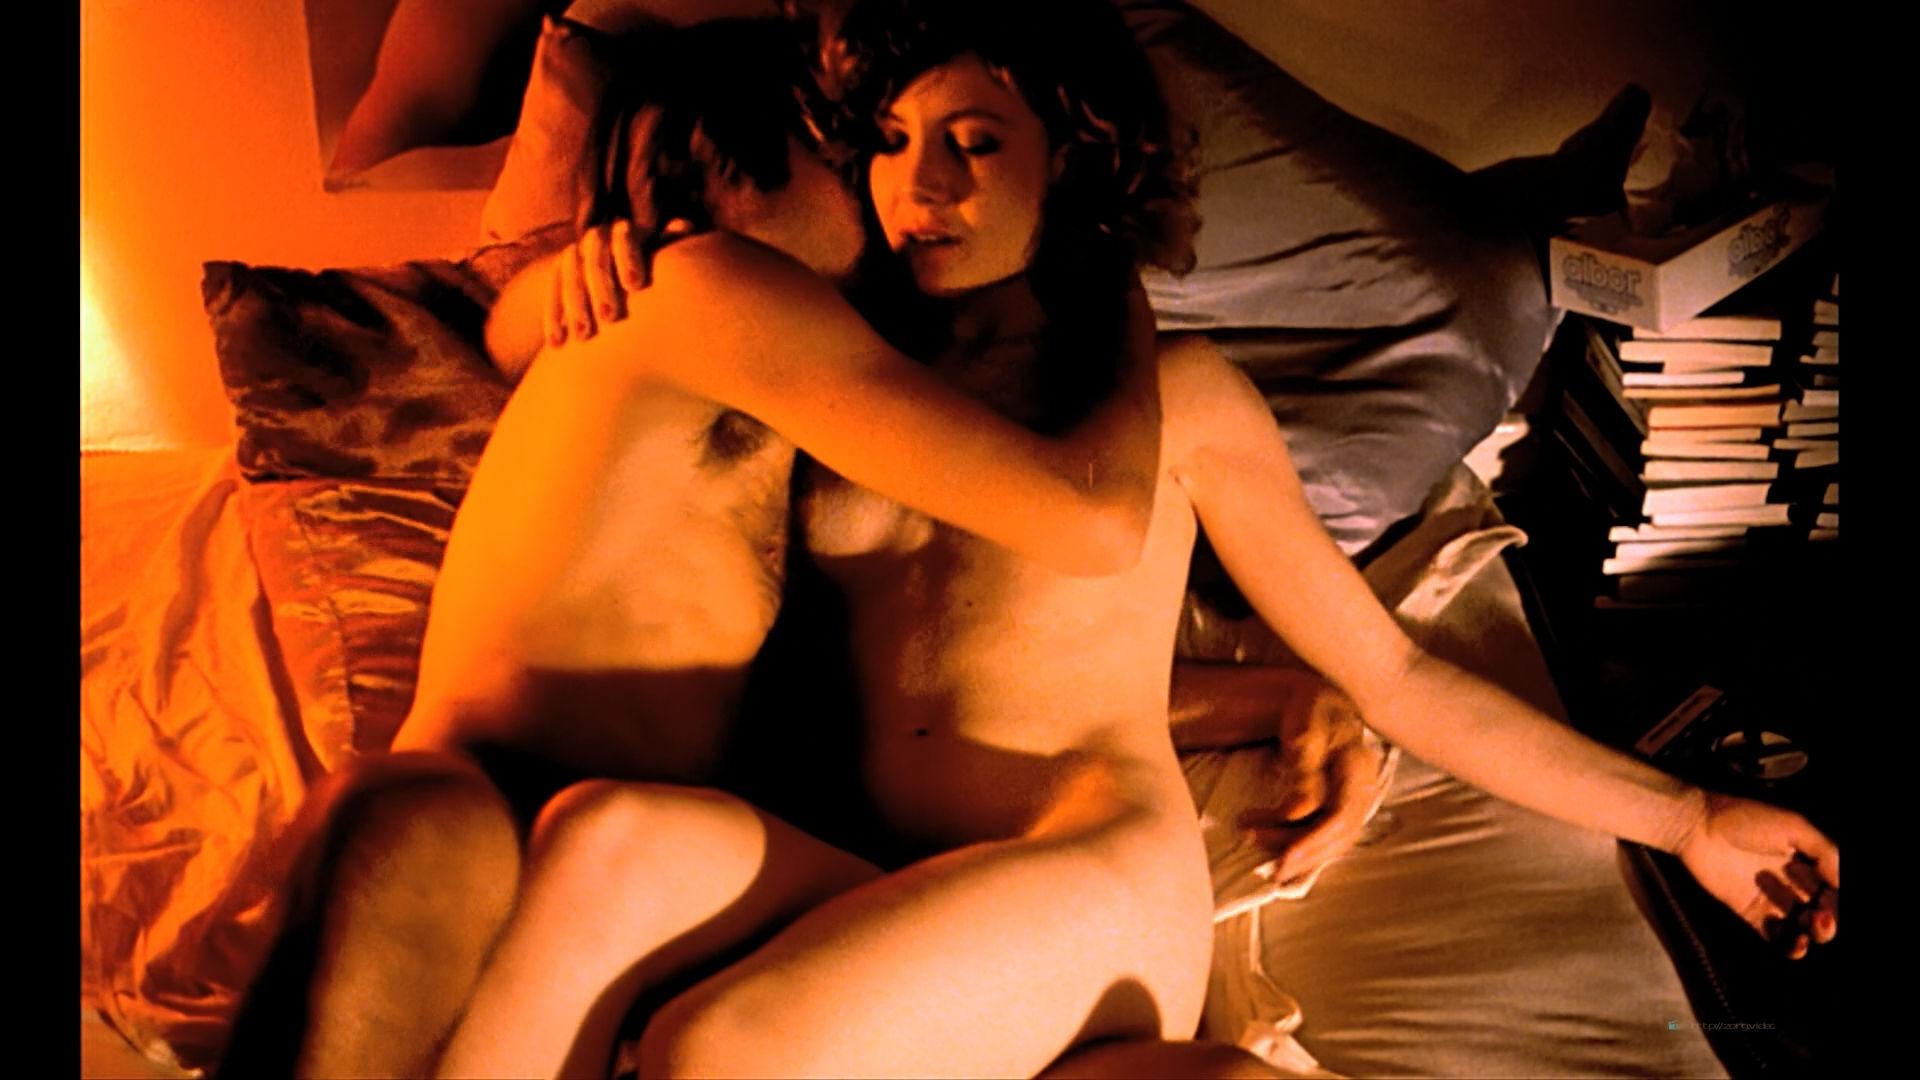 Cecilia Roth nude and sex - Rapture (ES-1979) HD 1080p BluRay (7)